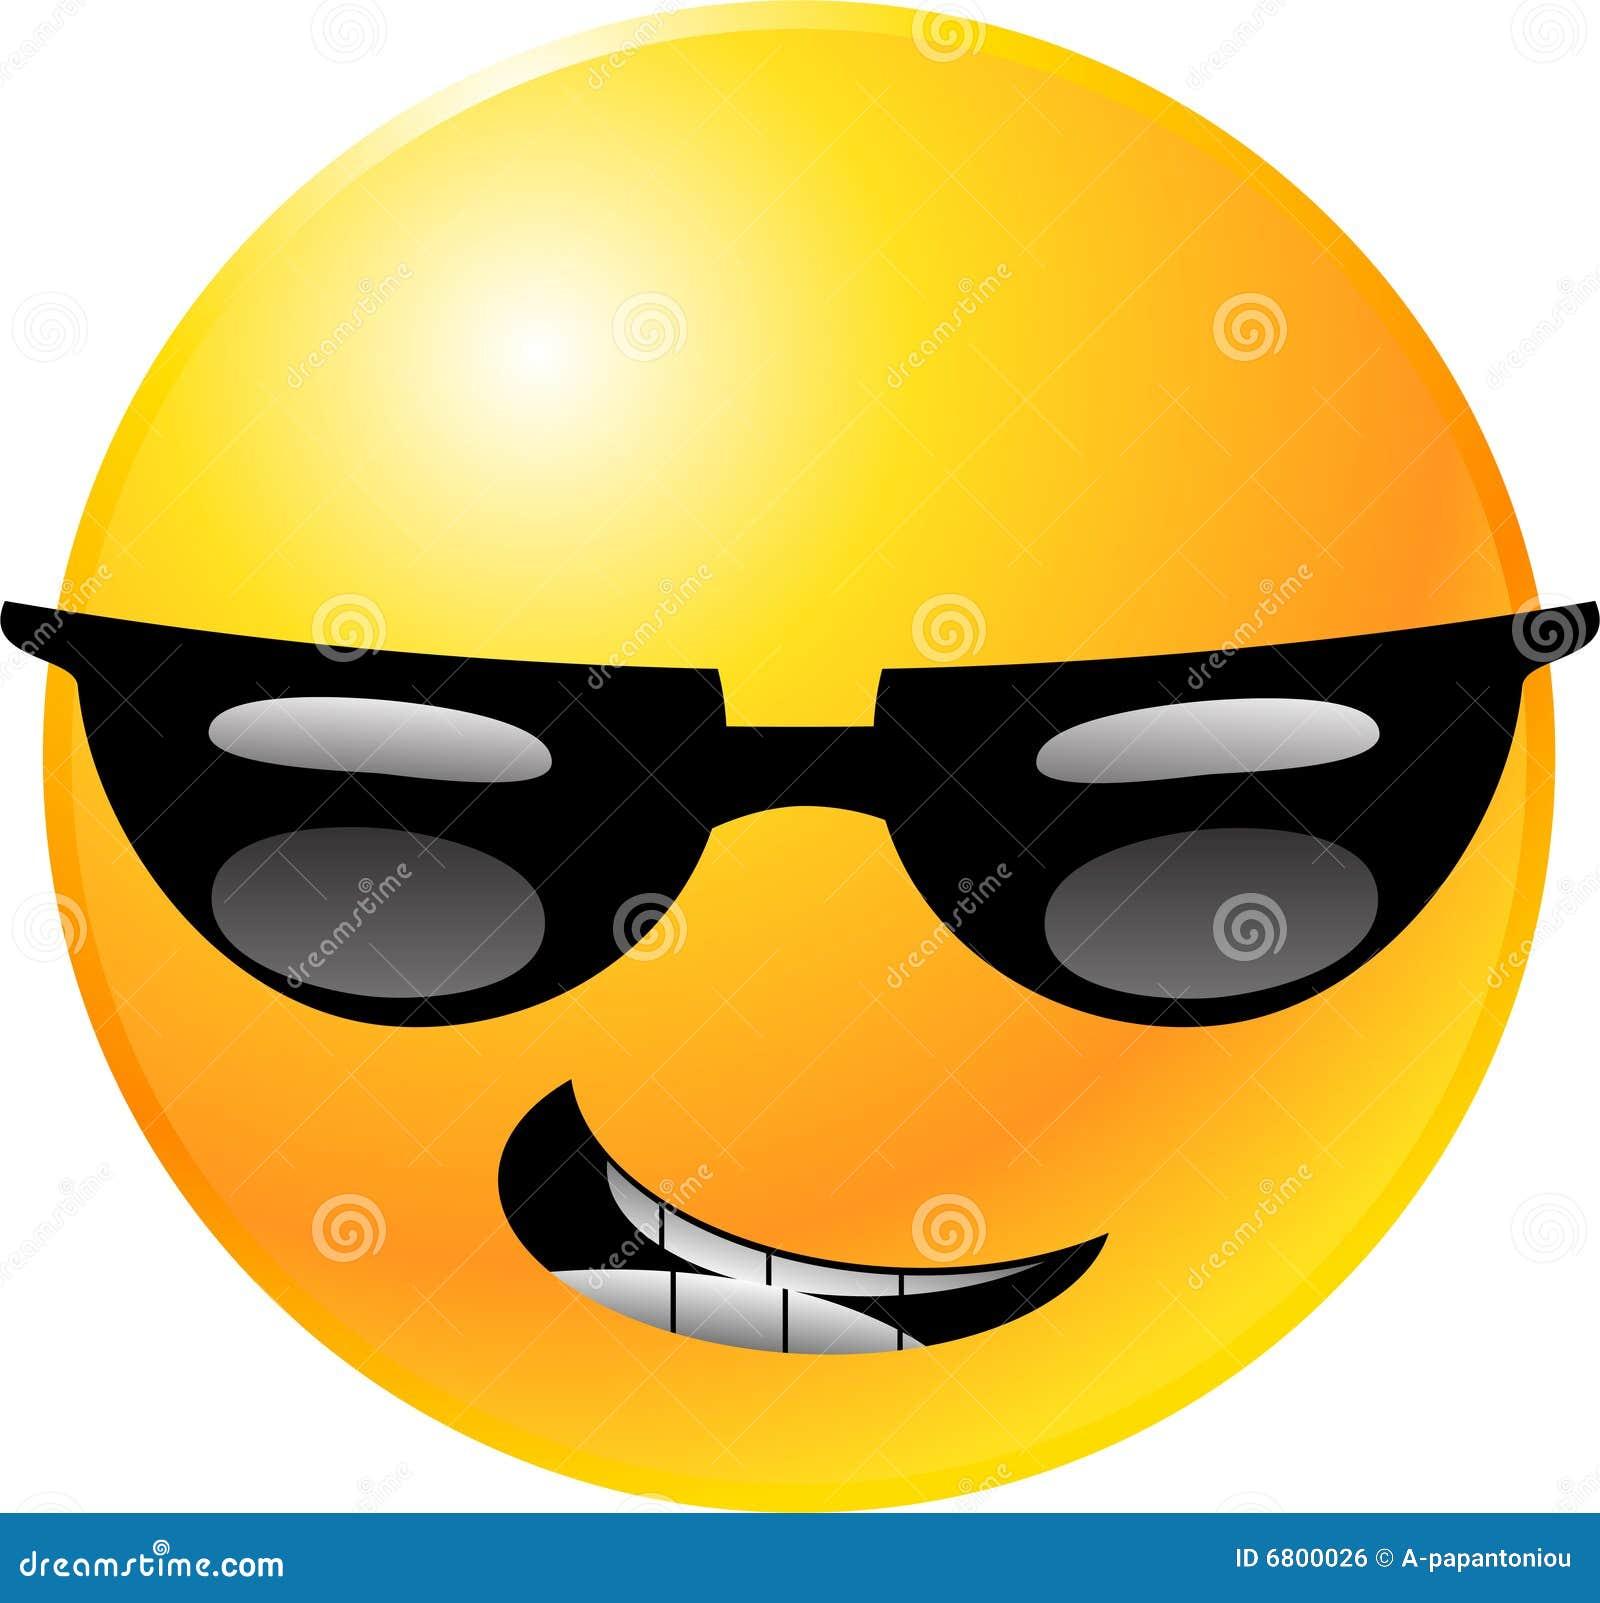 Emoticon Smiley Face Stock Vector. Illustration Of Head